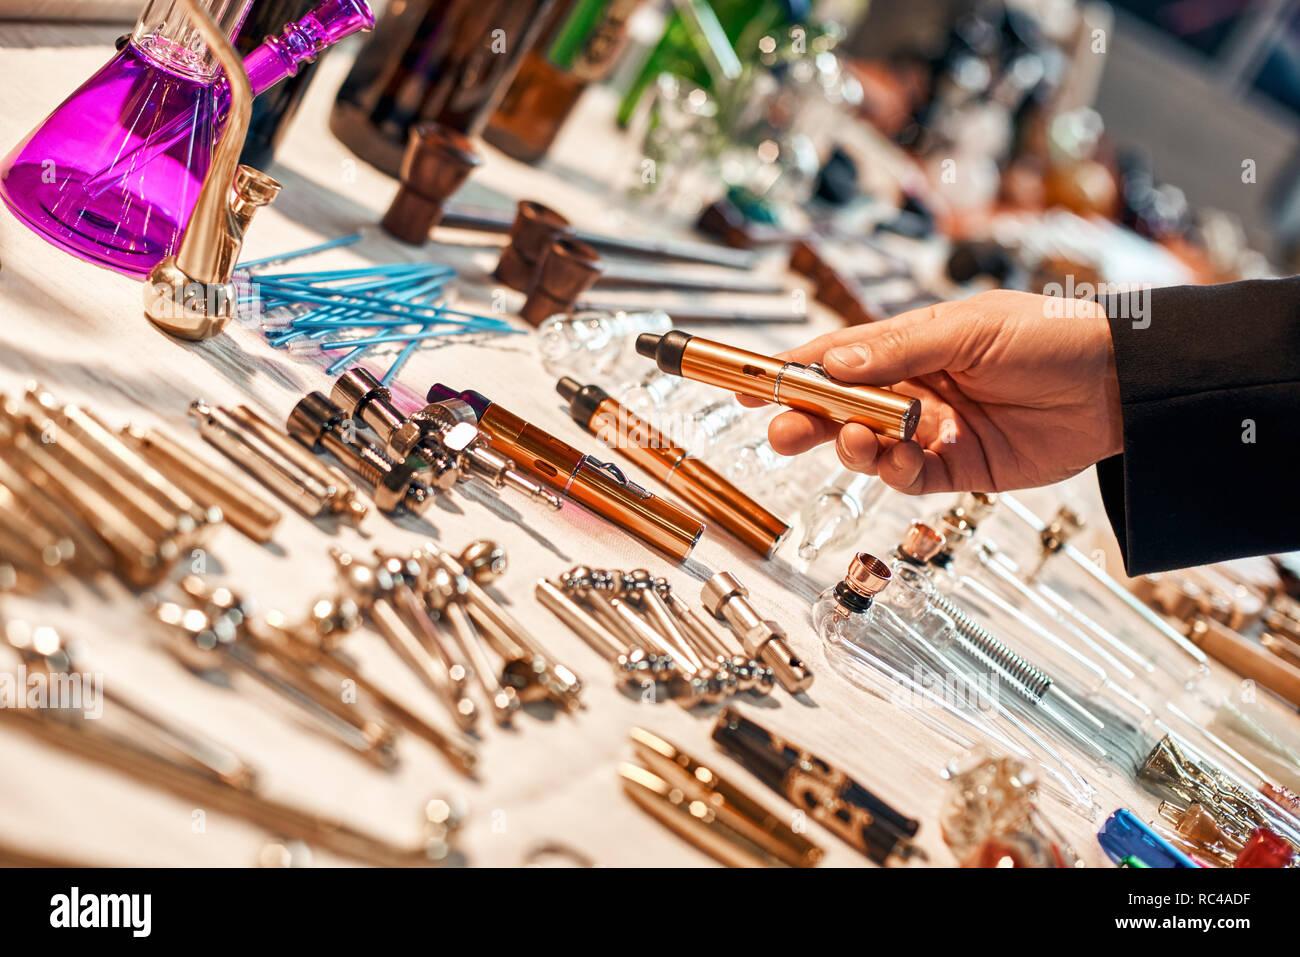 Tools for ganja handmade. Device for smoking marijuana. Items for home made device. Man's hand holding electronic vaporizer. Marijuana Electronic-Ciga - Stock Image